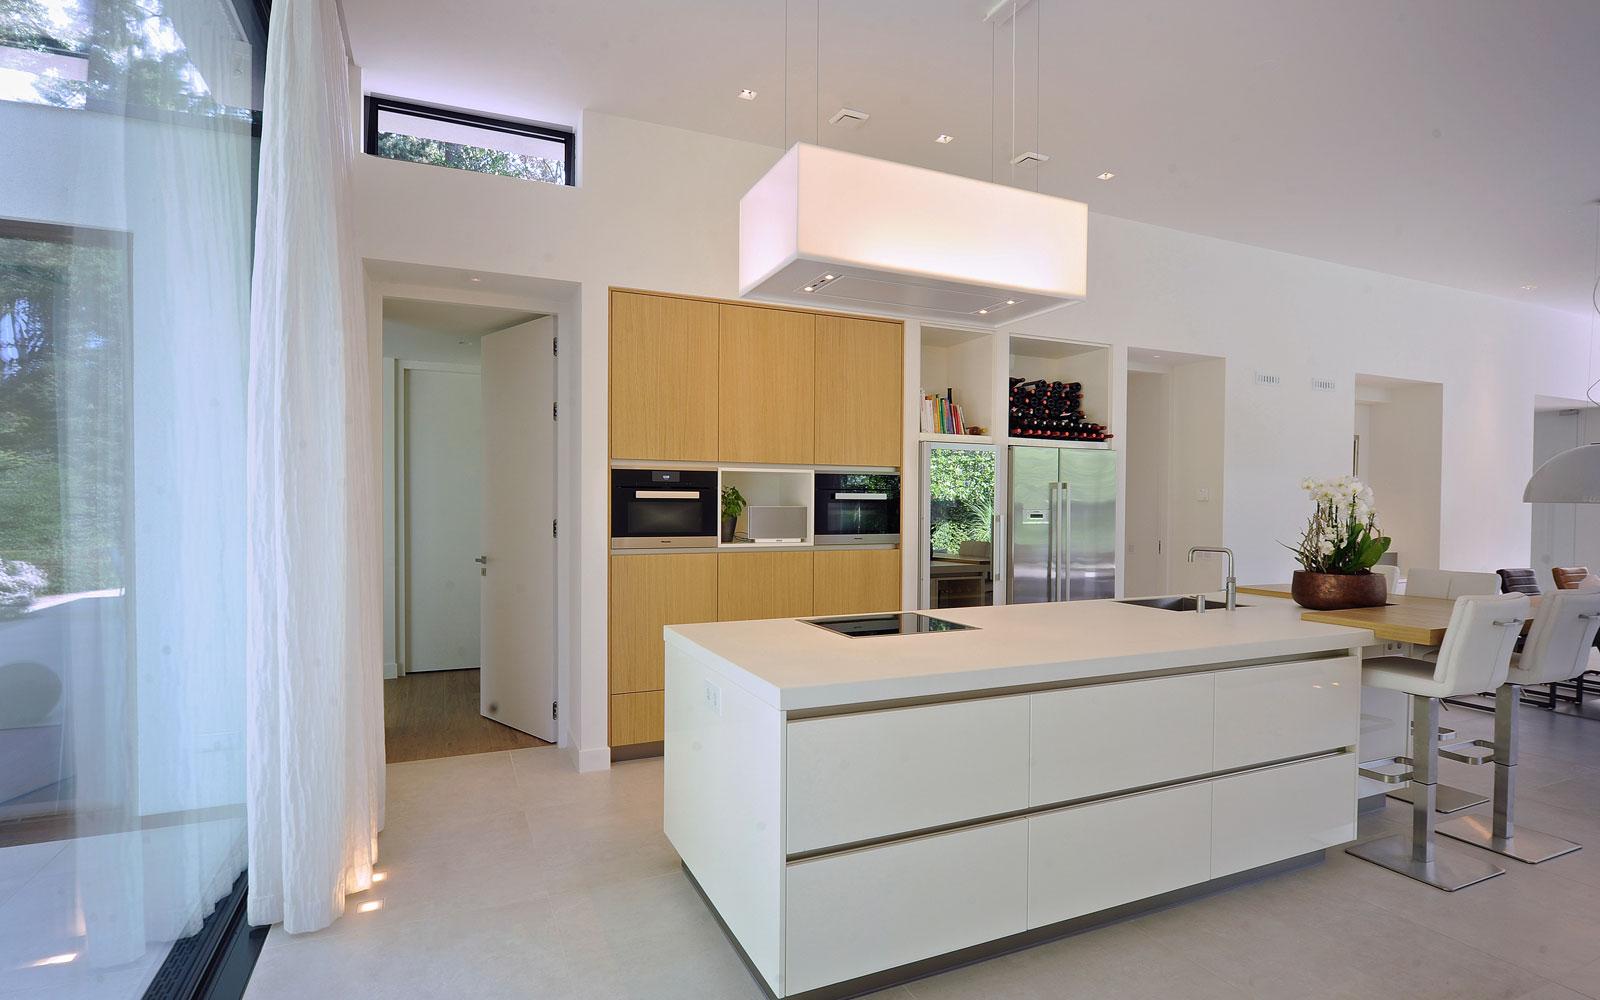 Strakke keuken, wit, kookeiland, Quooker, heetwaterkraan, eiken hout, moderne bungalow, Boxxis Architecten